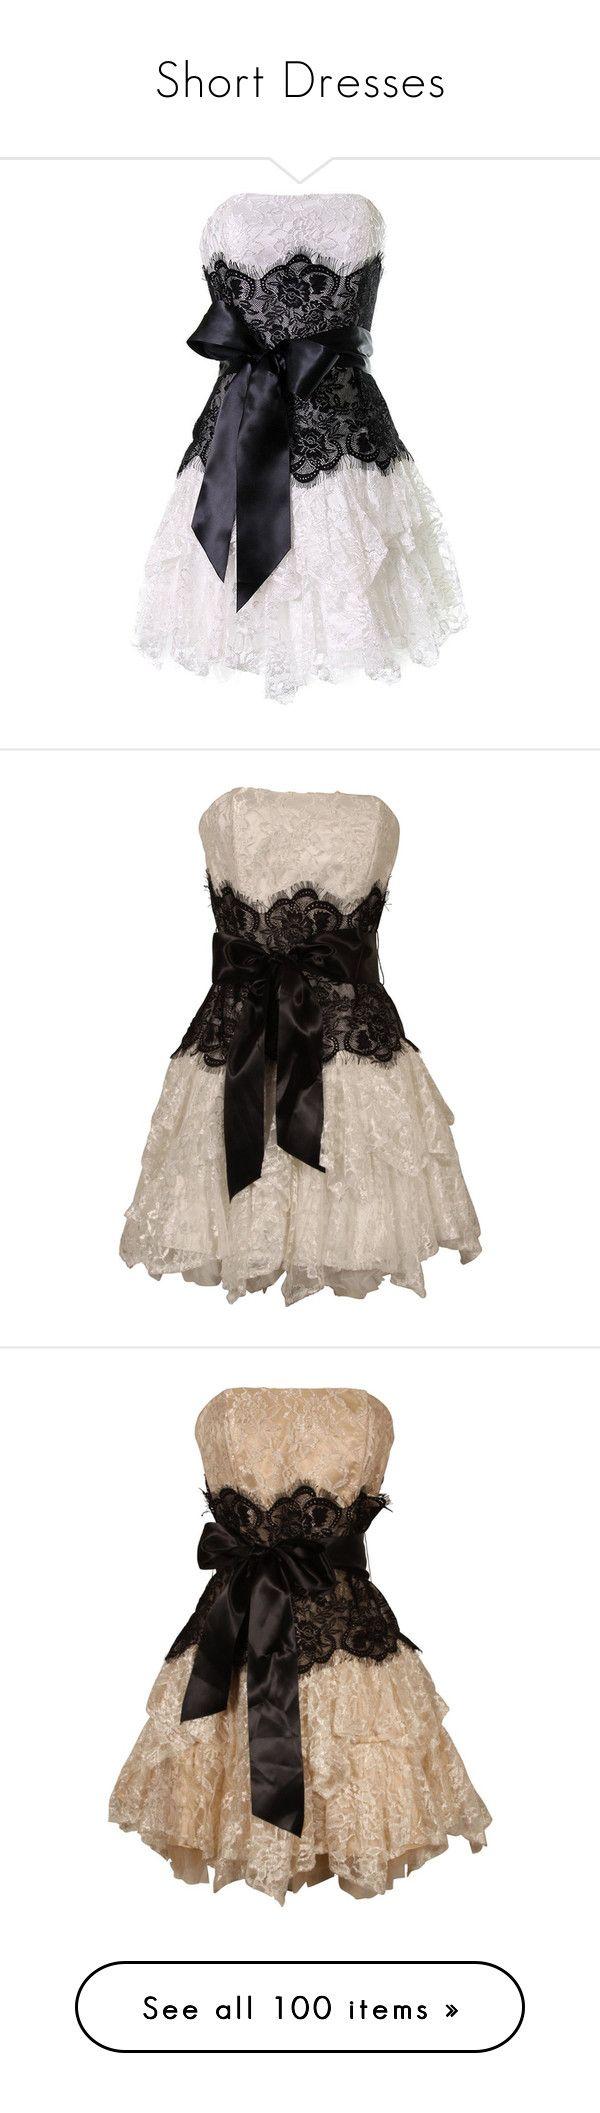 """Short Dresses"" by soledad-trinidad ❤ liked on Polyvore featuring dress, dresses, plus size lace dress, short prom dresses, plus size prom dresses, women plus size dresses, black strapless dress, vestidos, short dresses y vestiti"